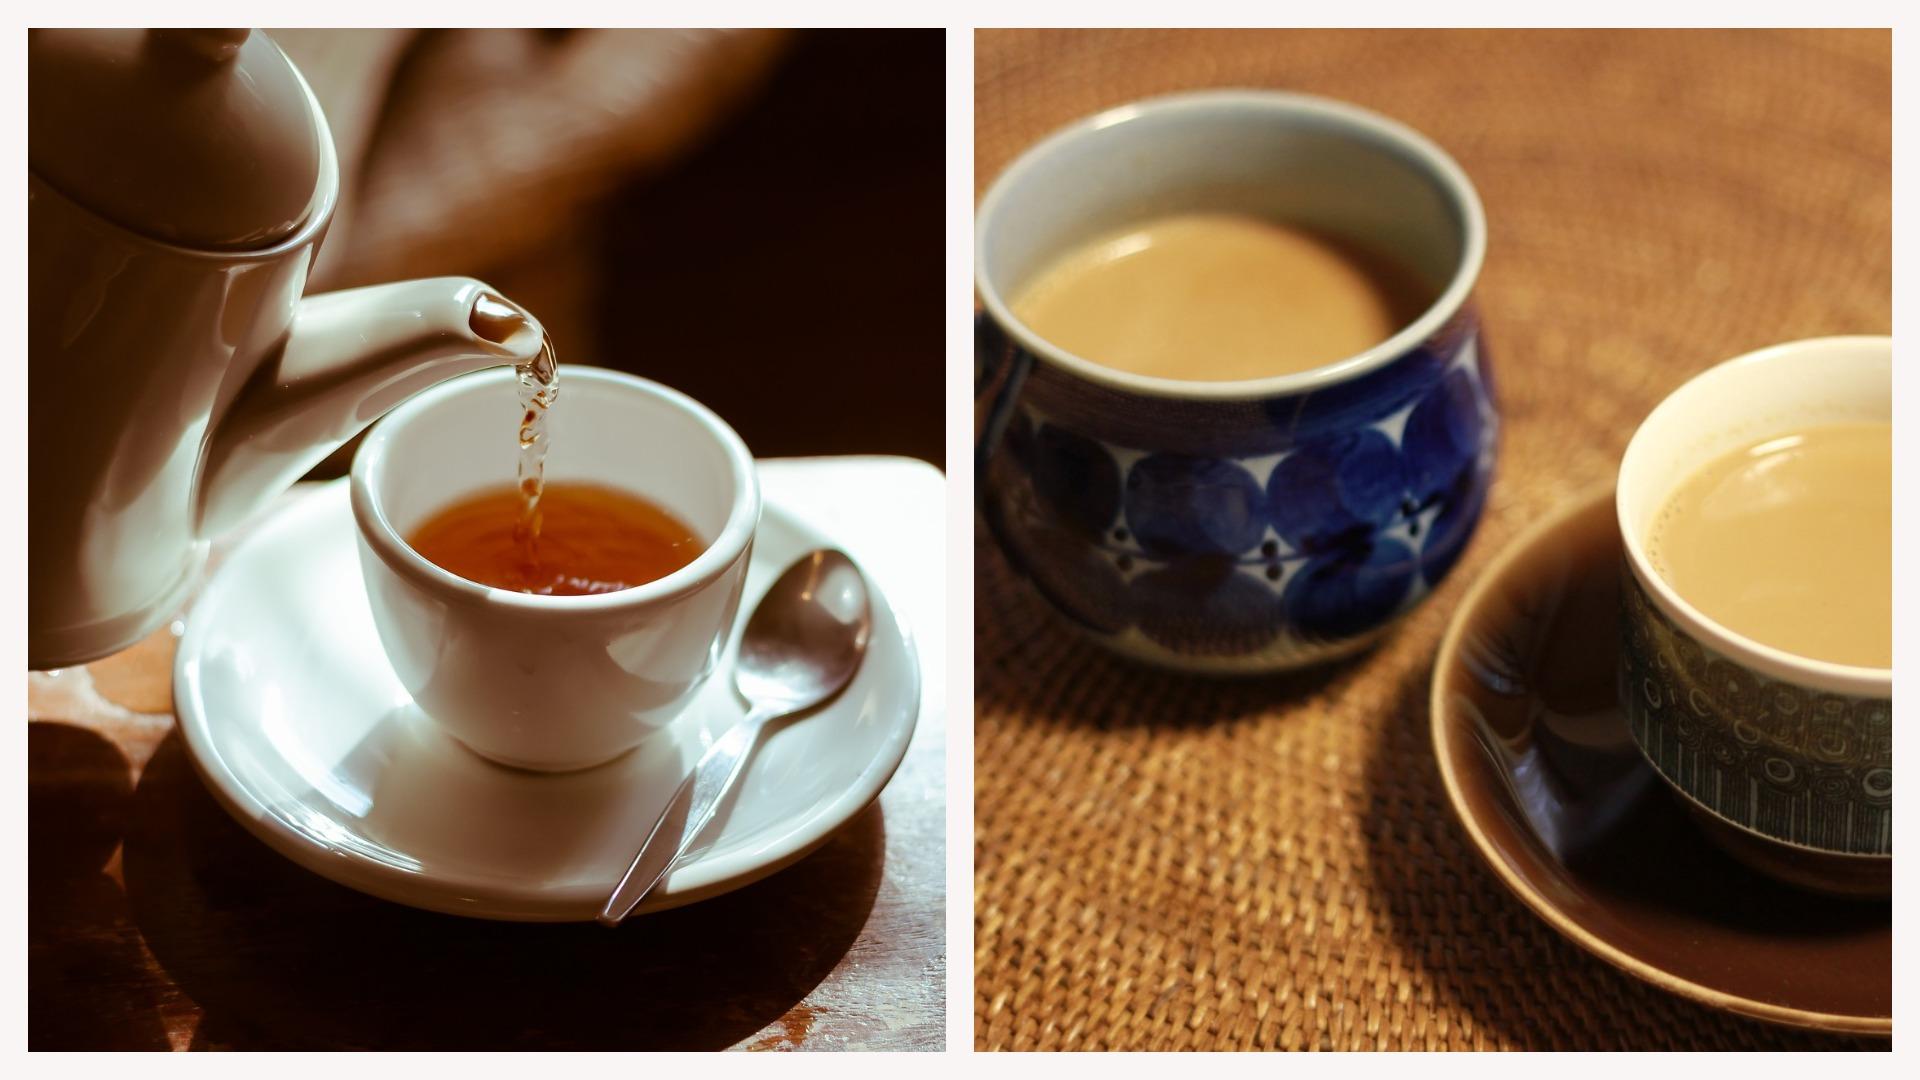 Chai vs Green tea health benefits